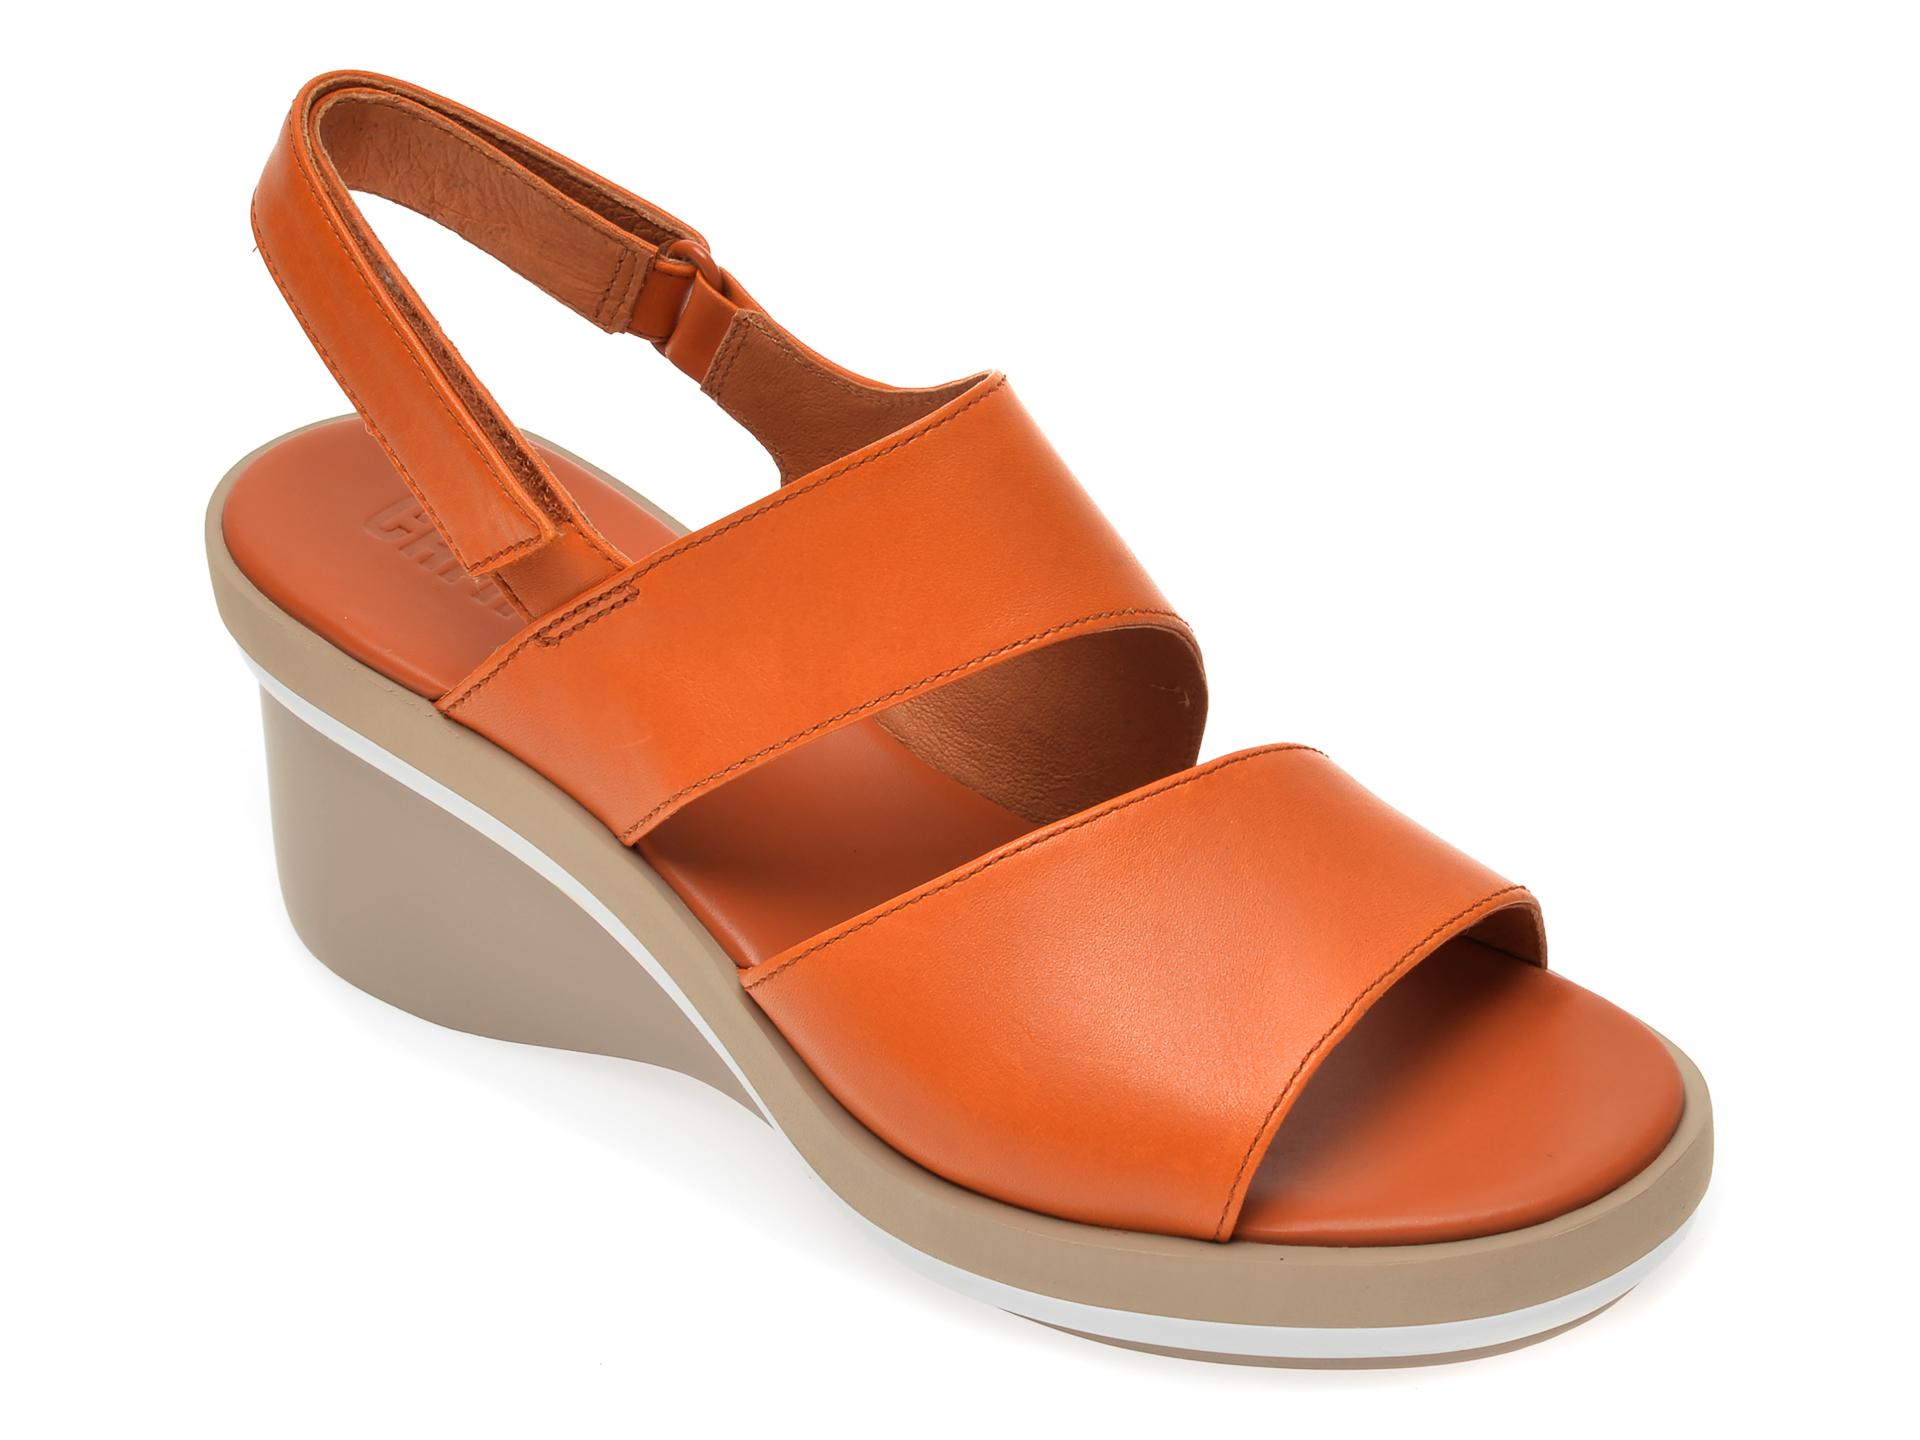 Sandale CAMPER maro, K200965, din piele naturala imagine